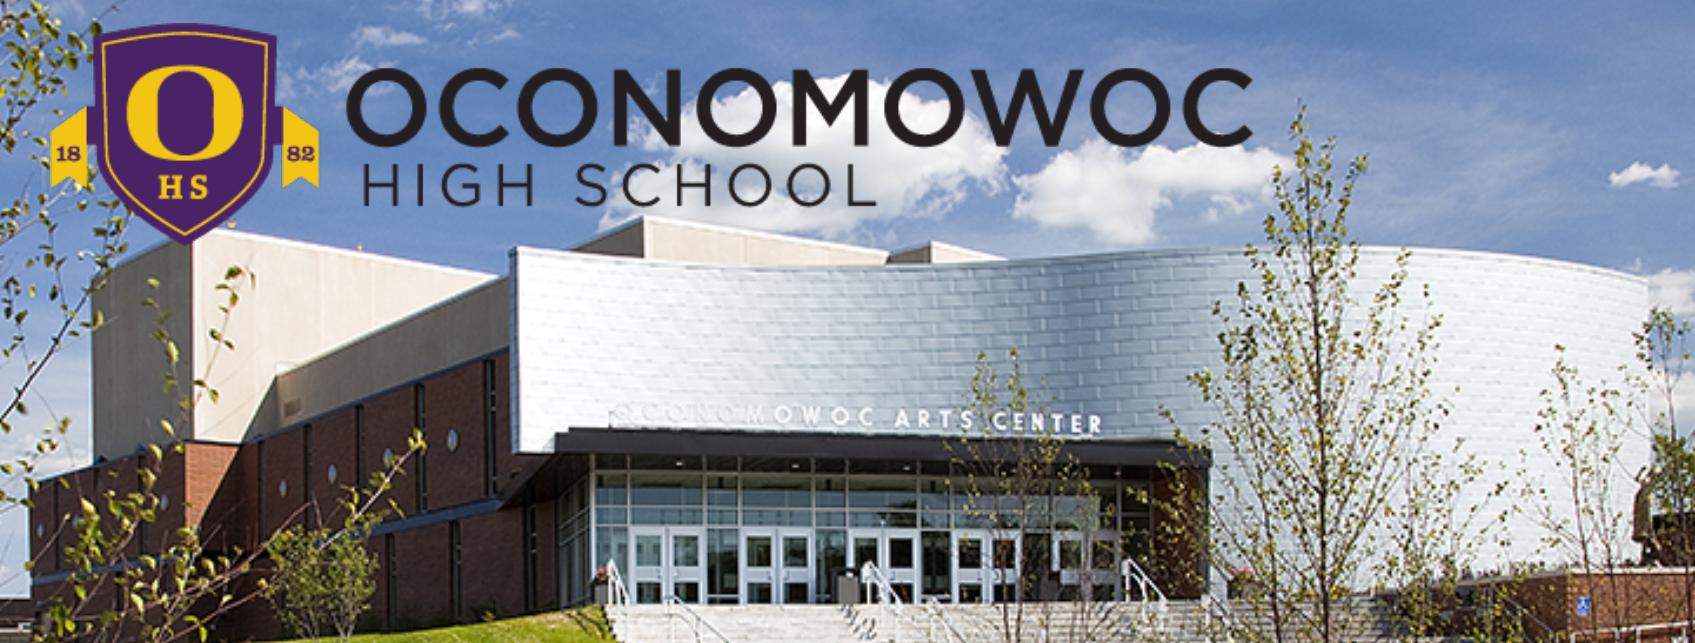 Master Classes - Oconomowoc High School